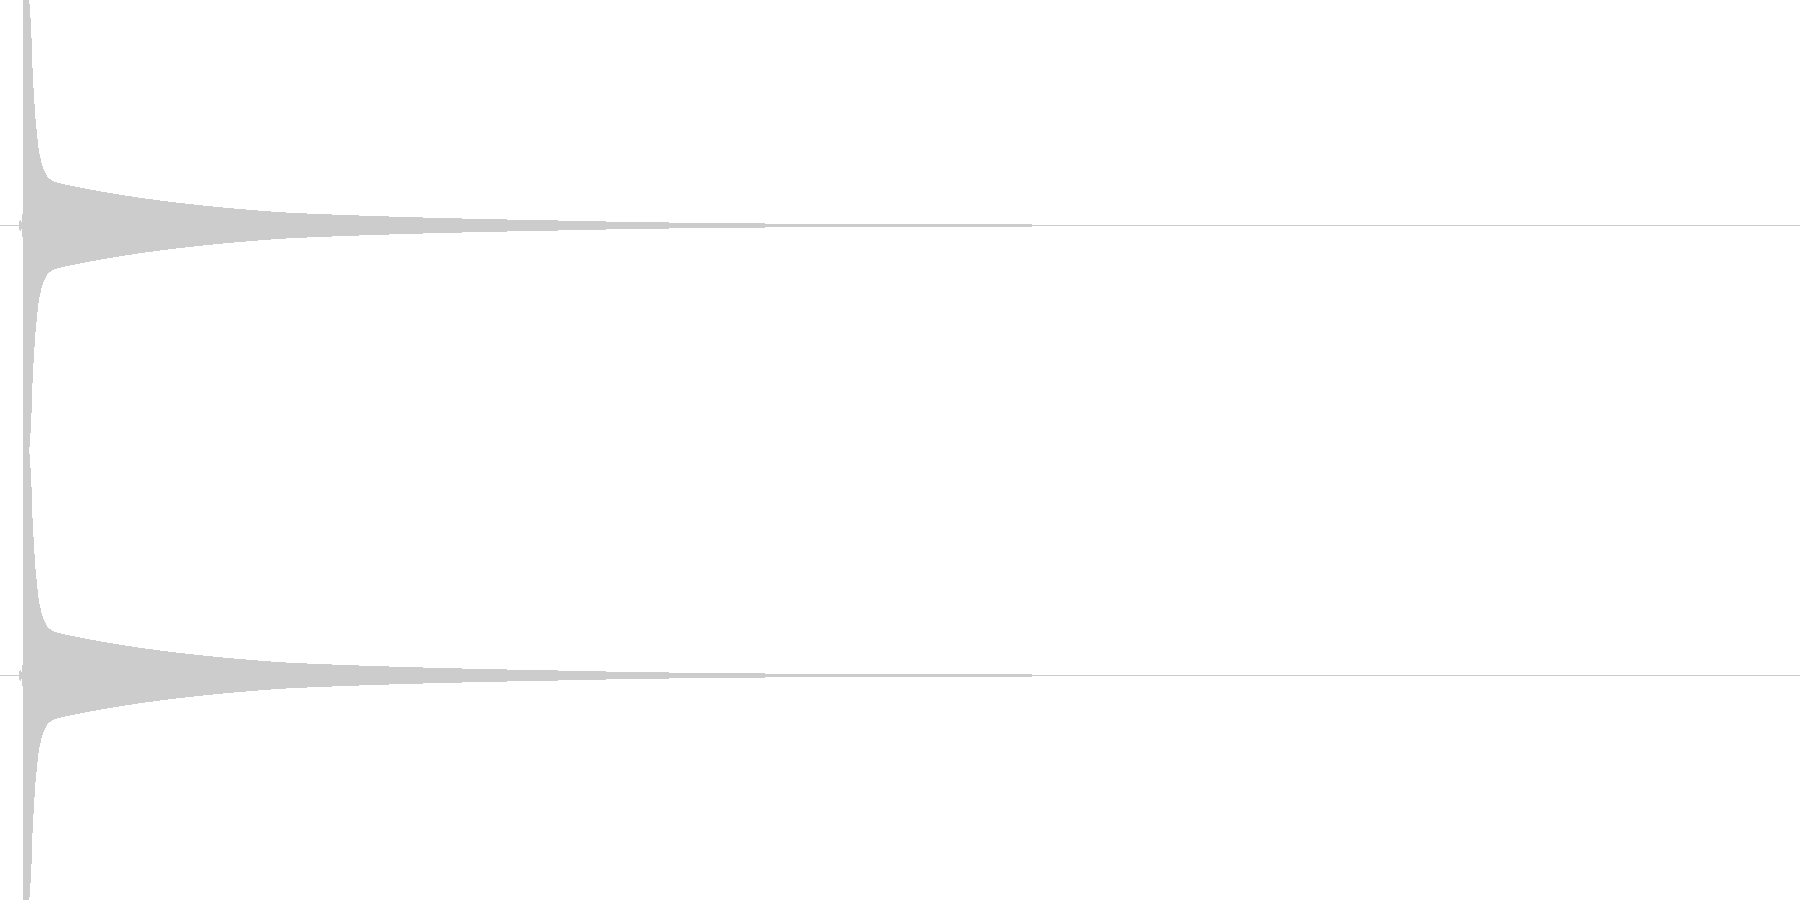 【SE】ピーン02(ピッチ中)の未再生の波形